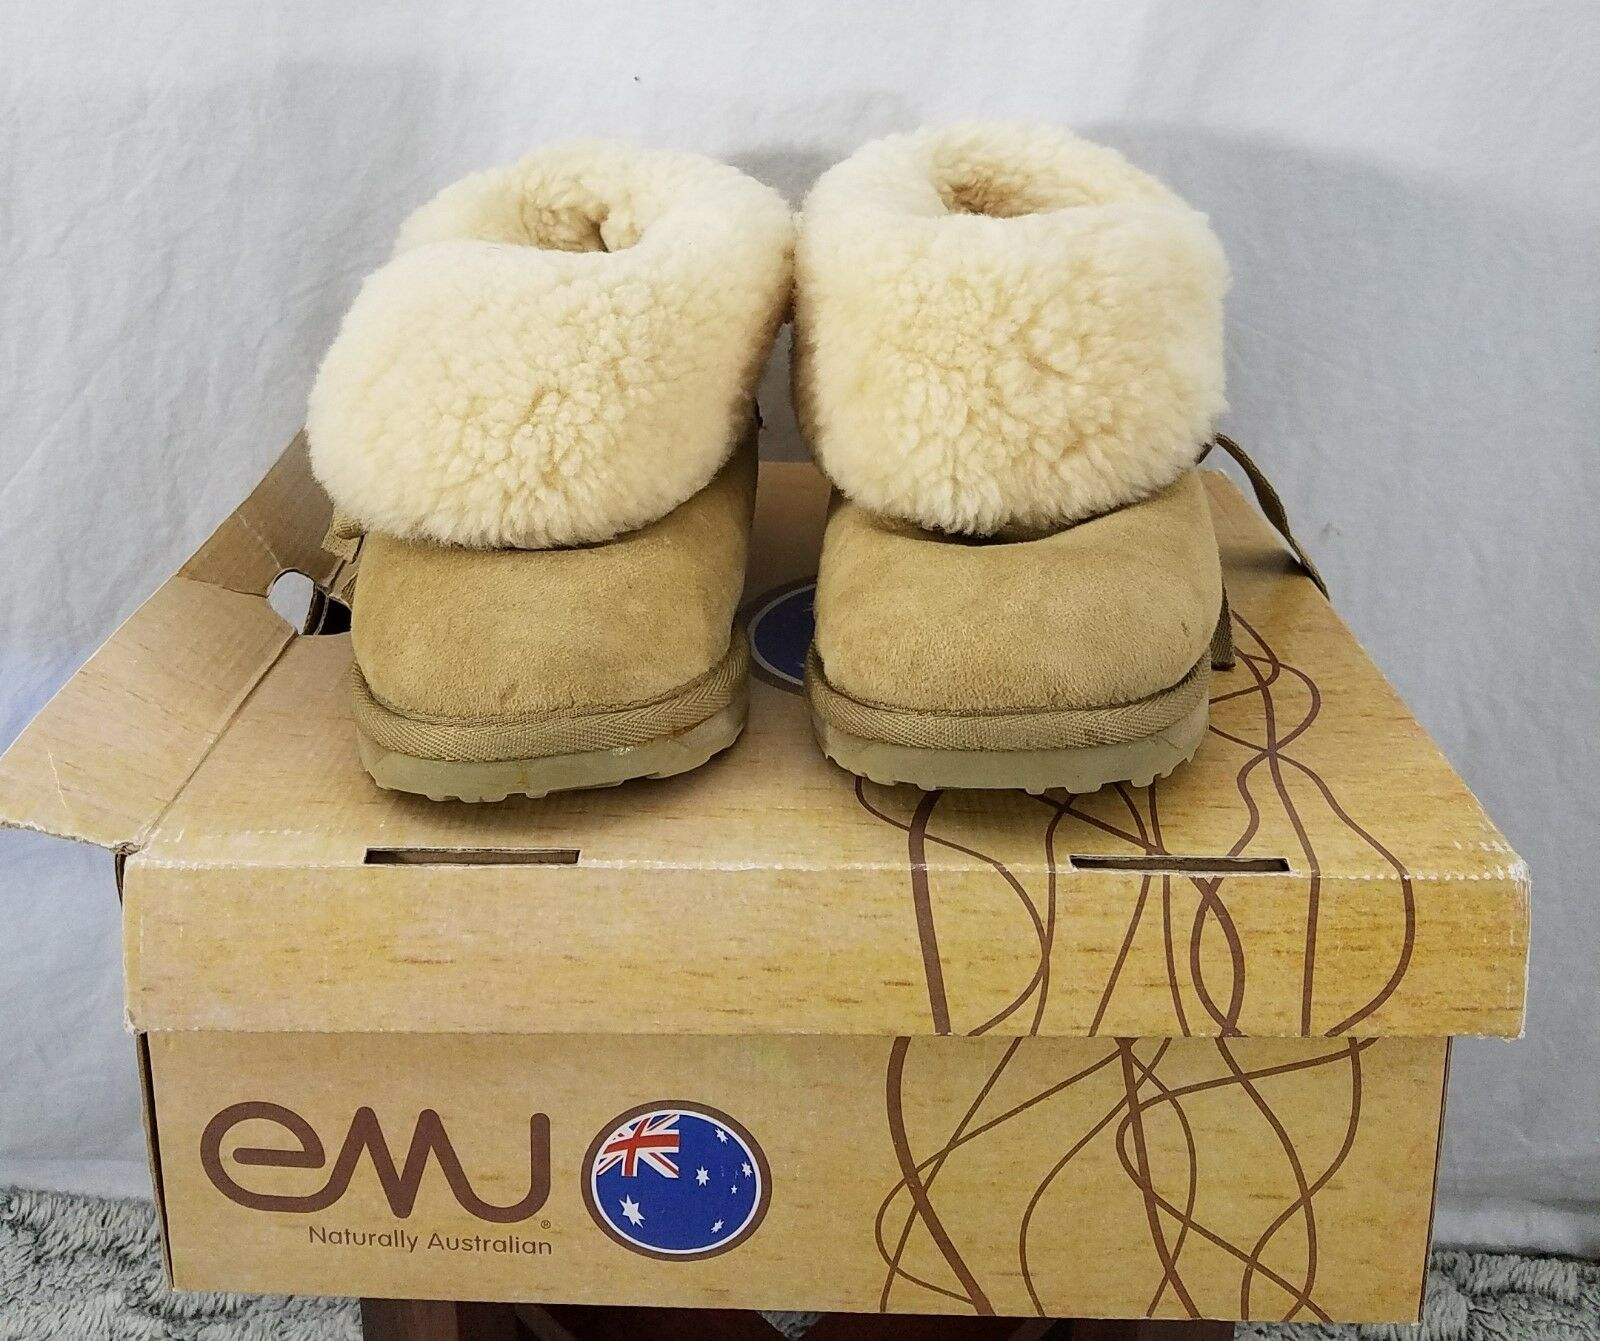 New EMU Australian Womens Short Winter Boots Tan Sheepskin Bows Size 6.5